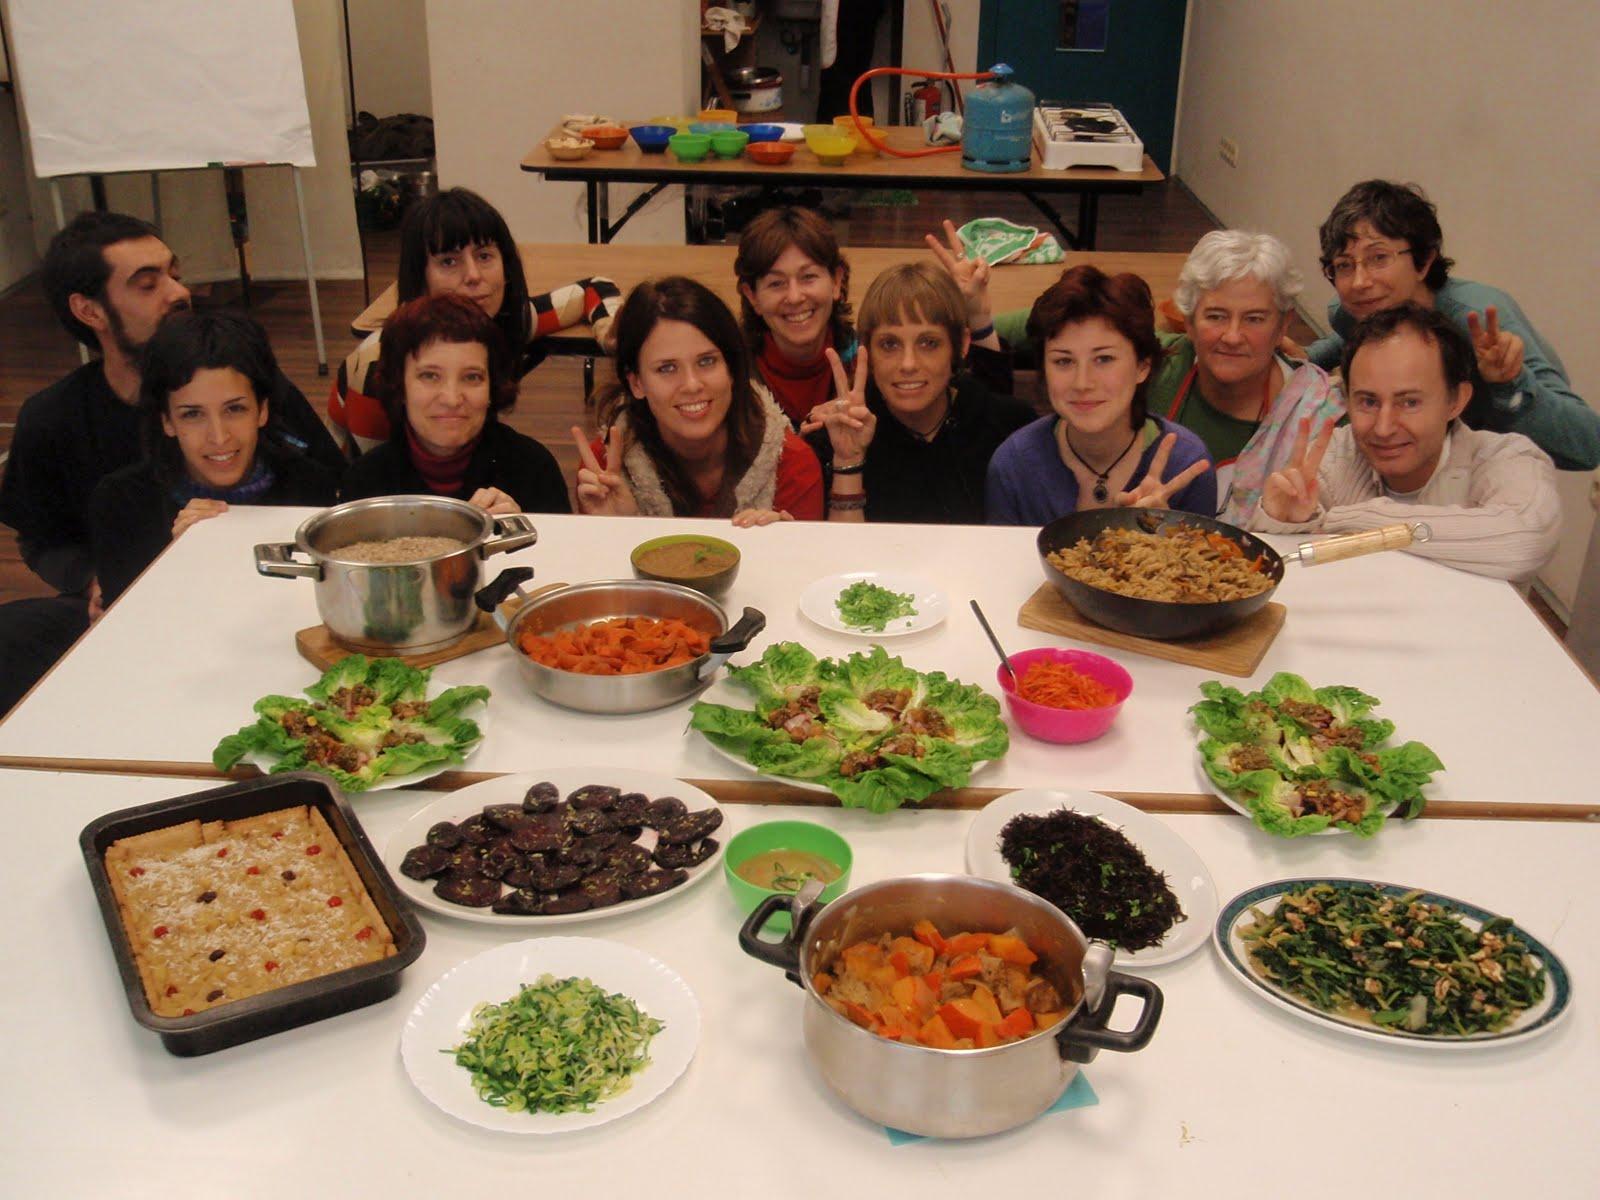 Formaci n profesional gastronom a aulacat cursos for Formacion profesional cocina